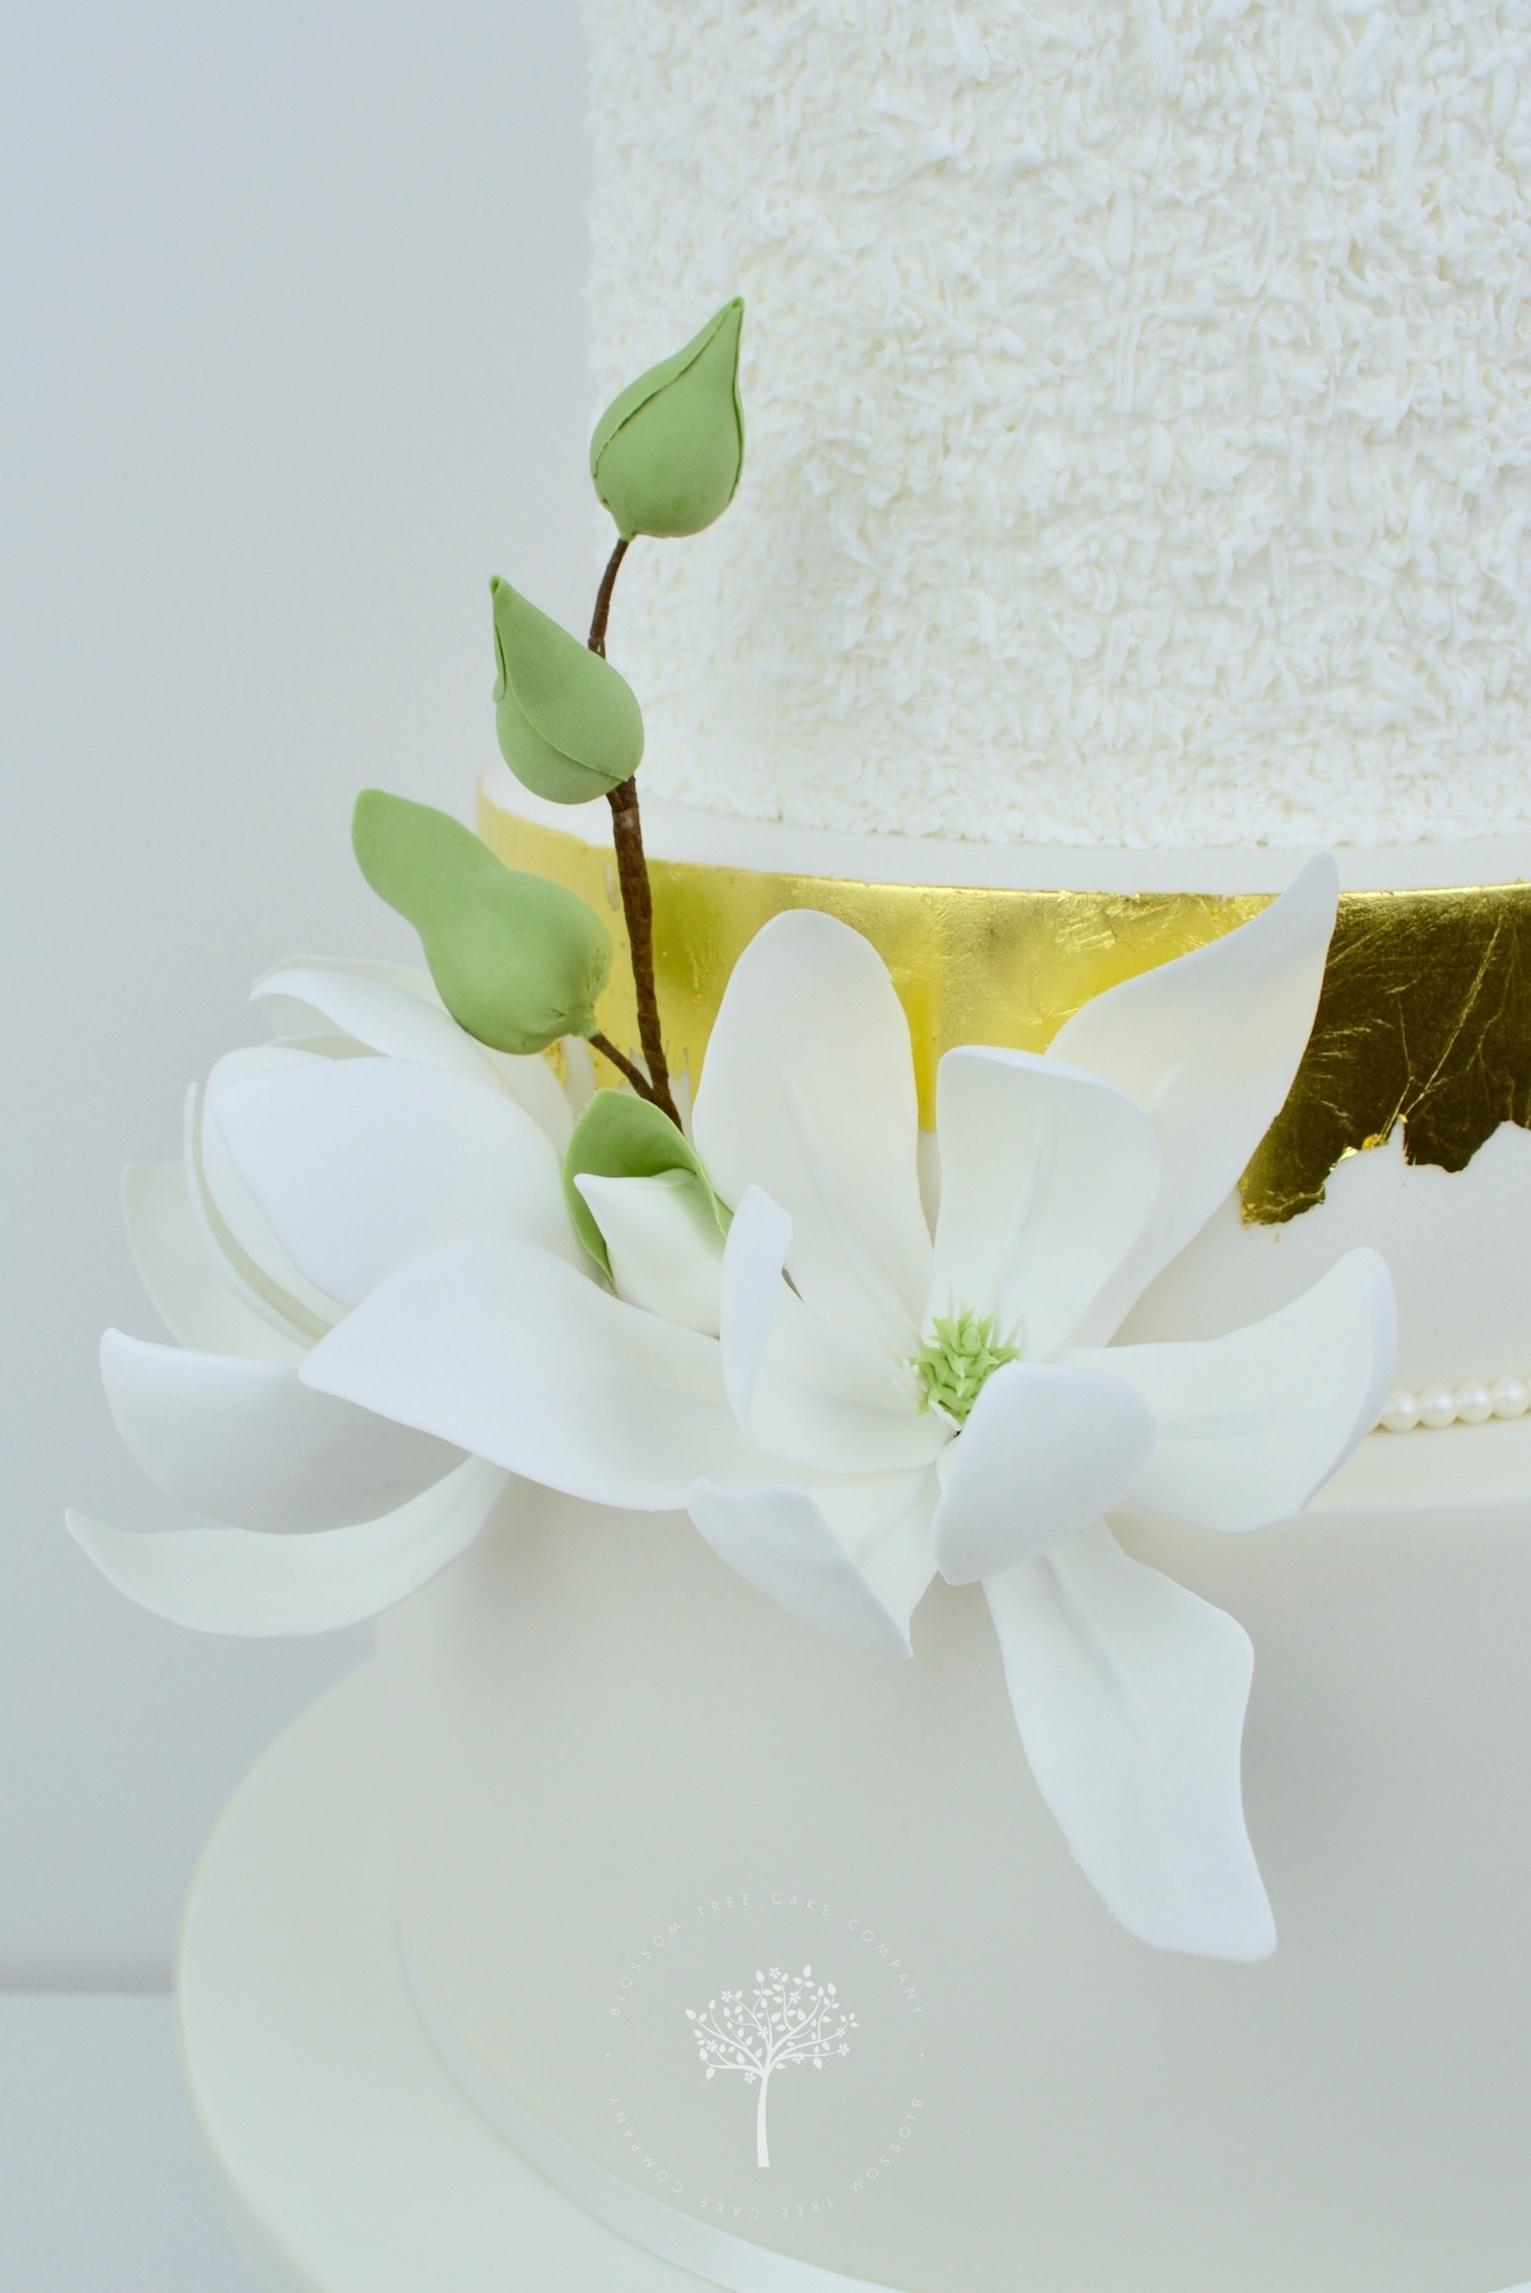 White Magnolias wedding cake by Blossom Tree Cake Company Harrogate North Yorkshire - magnolias.jpg